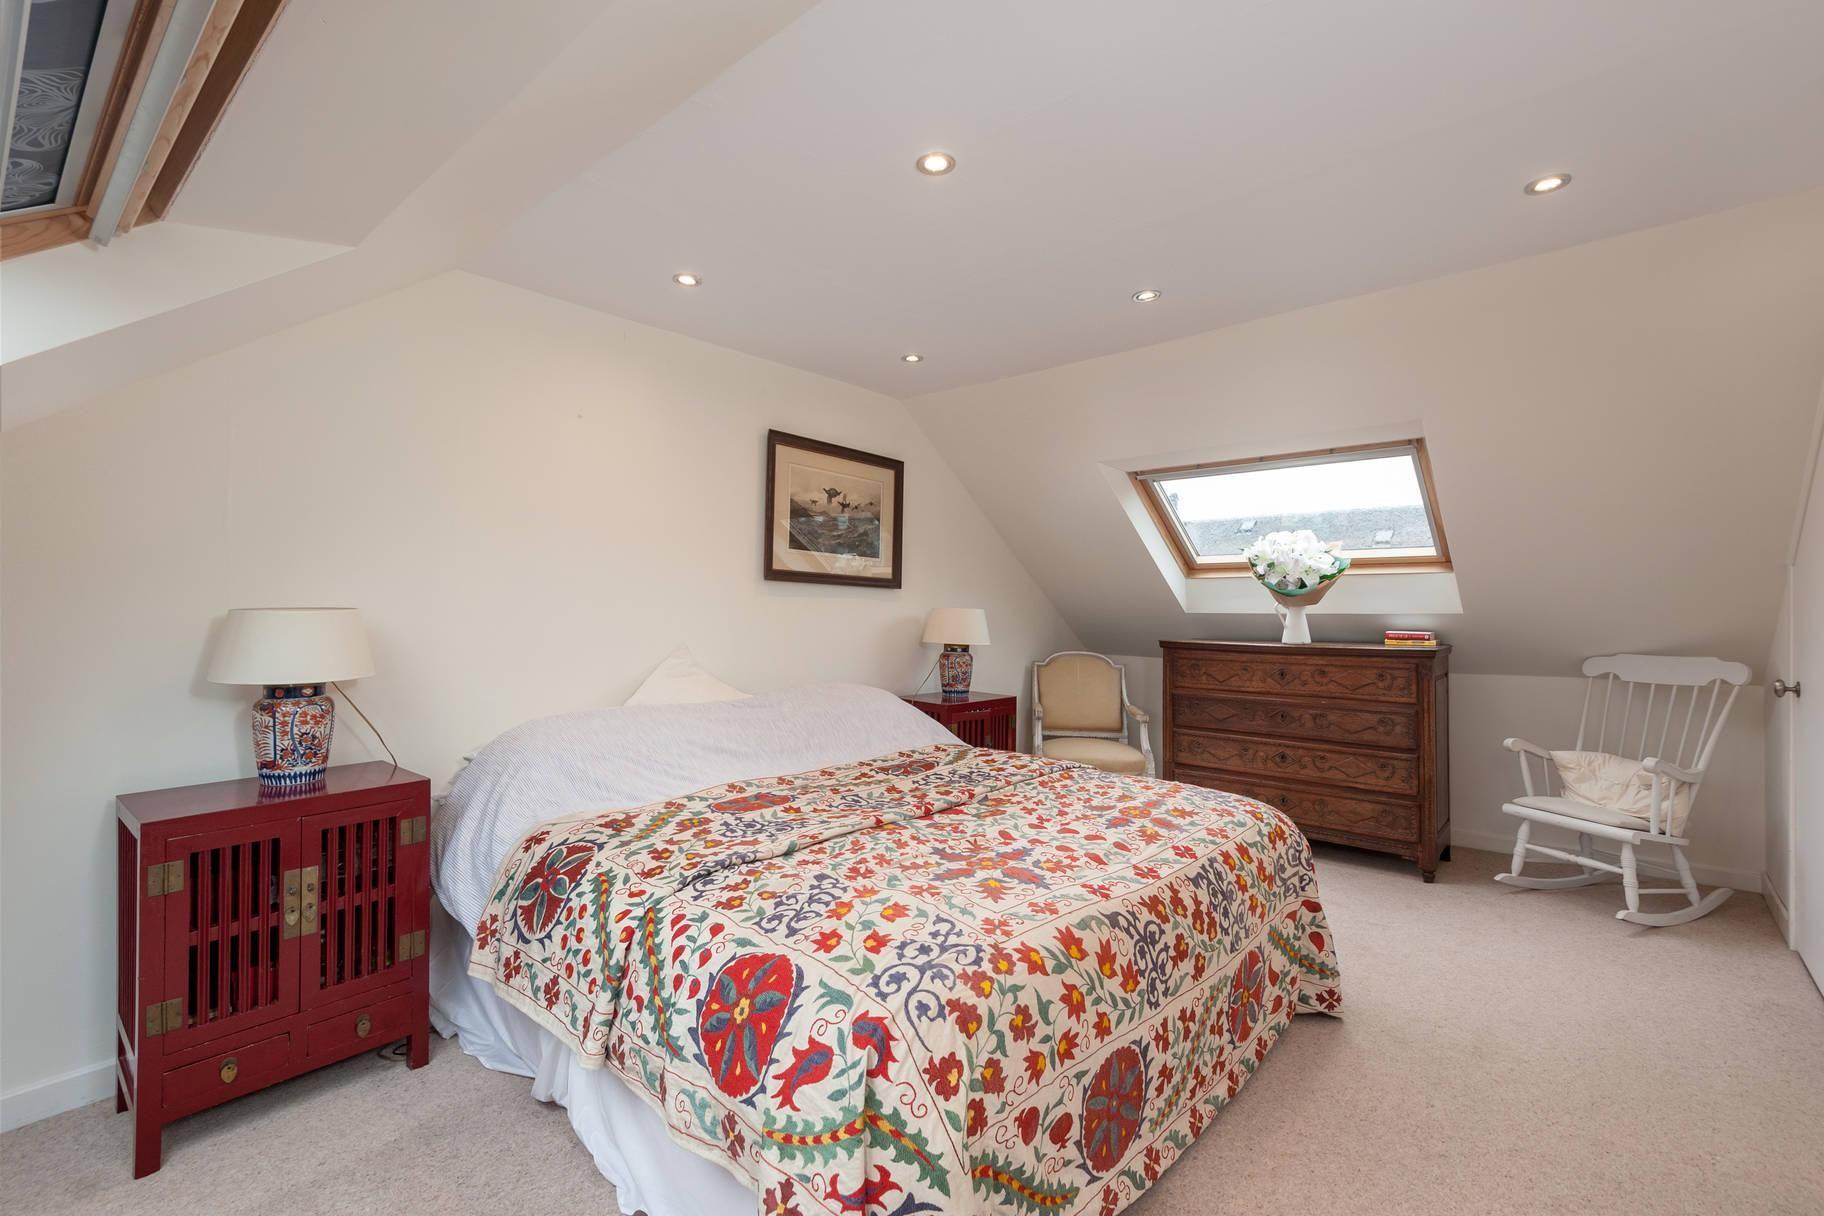 3 Briarbank Terrace, Shandon - Photo 5